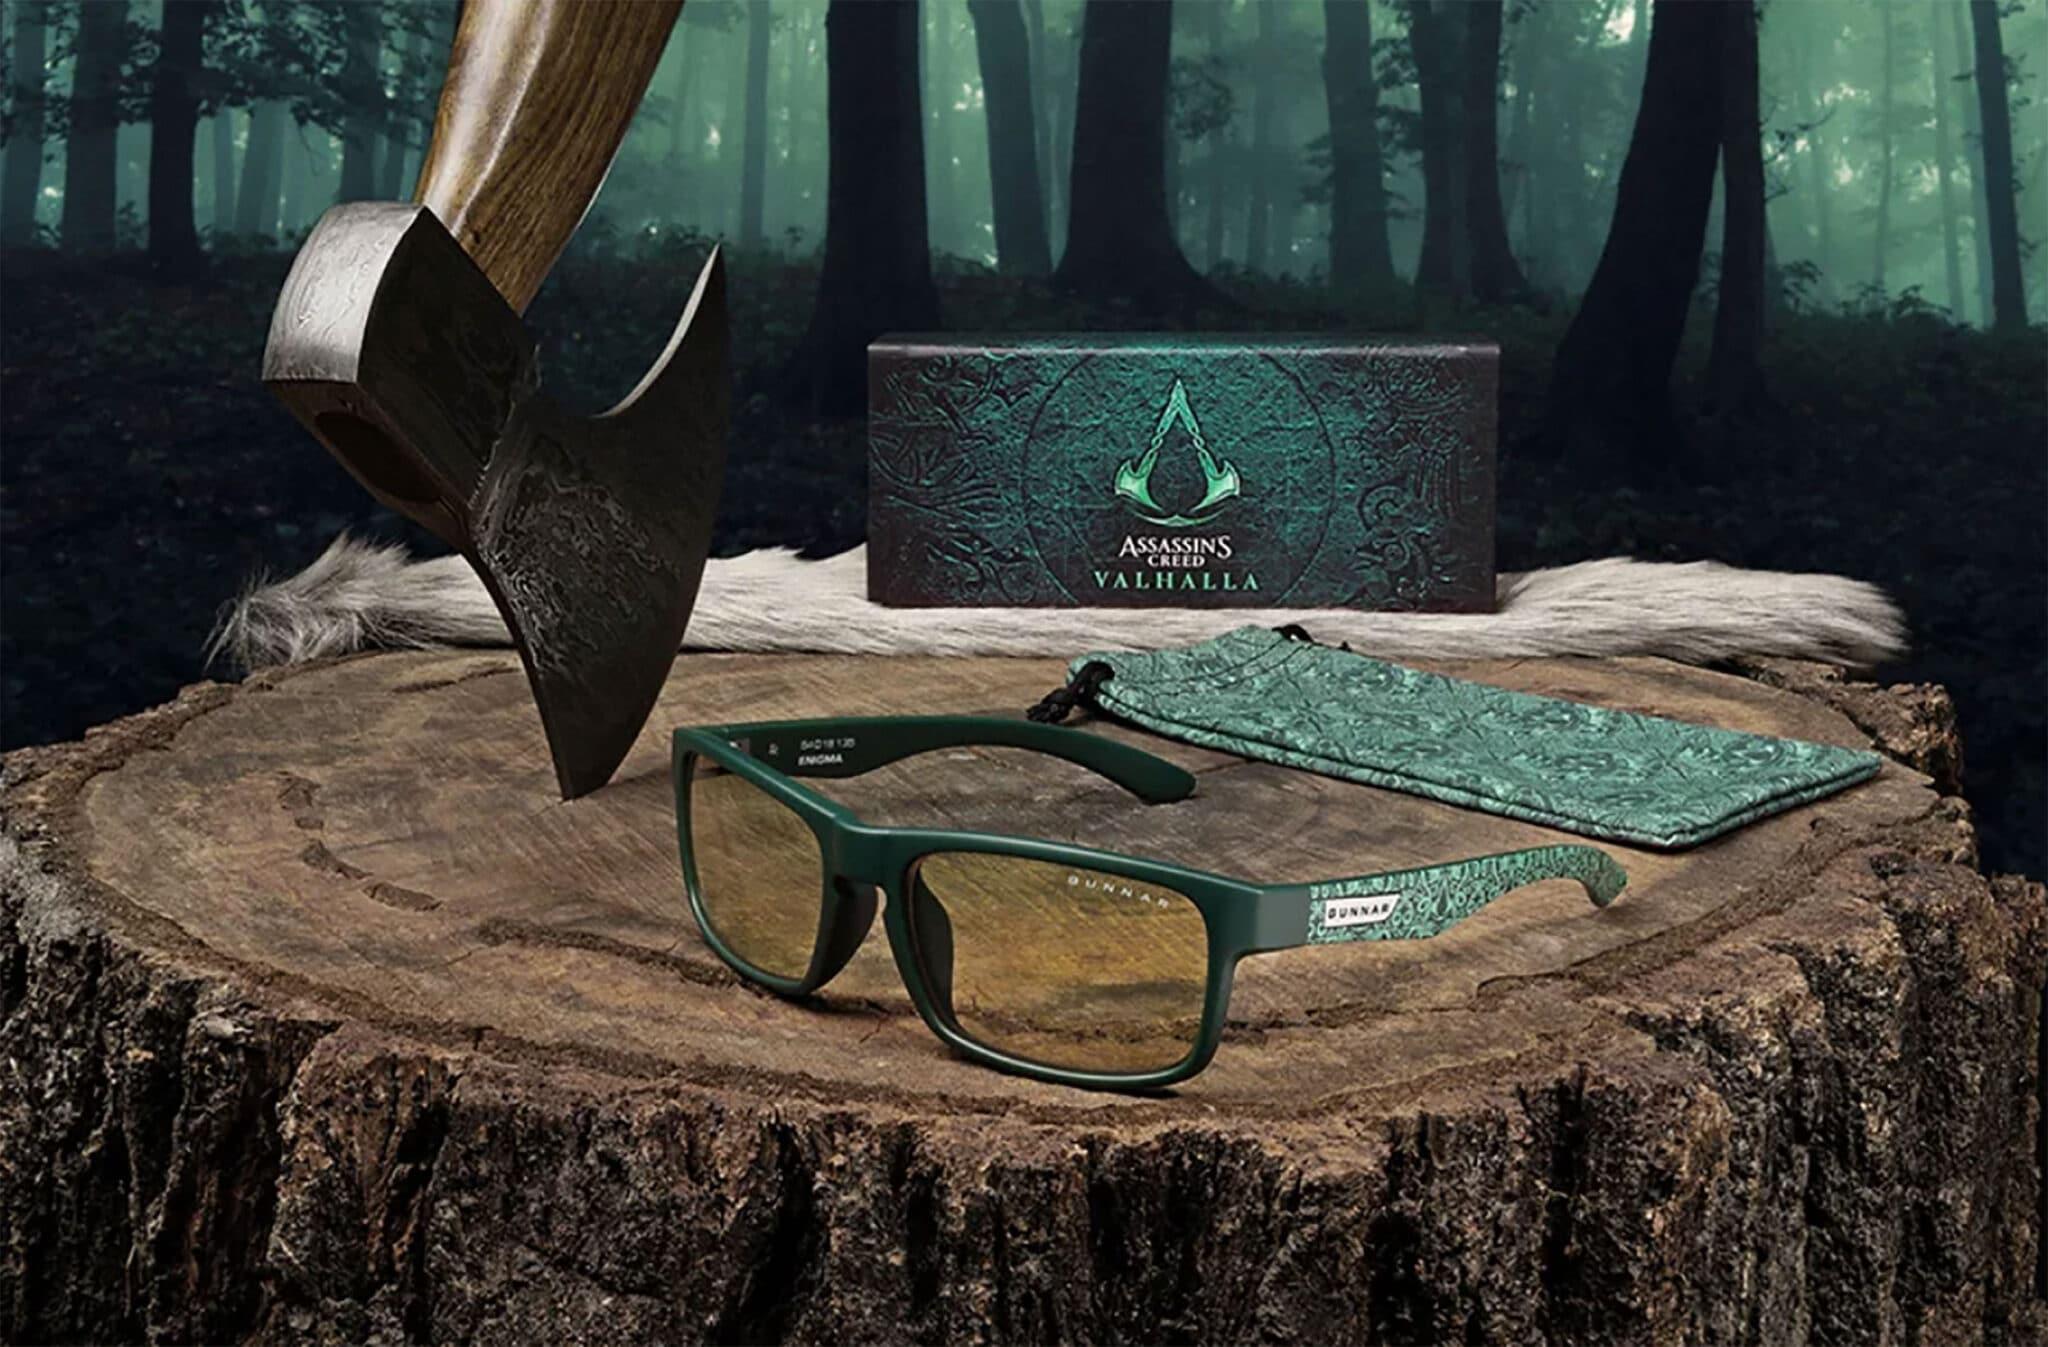 GUNNAR Optiks and Ubisoft Release 'Assassin's Creed Valhalla' Eyewear